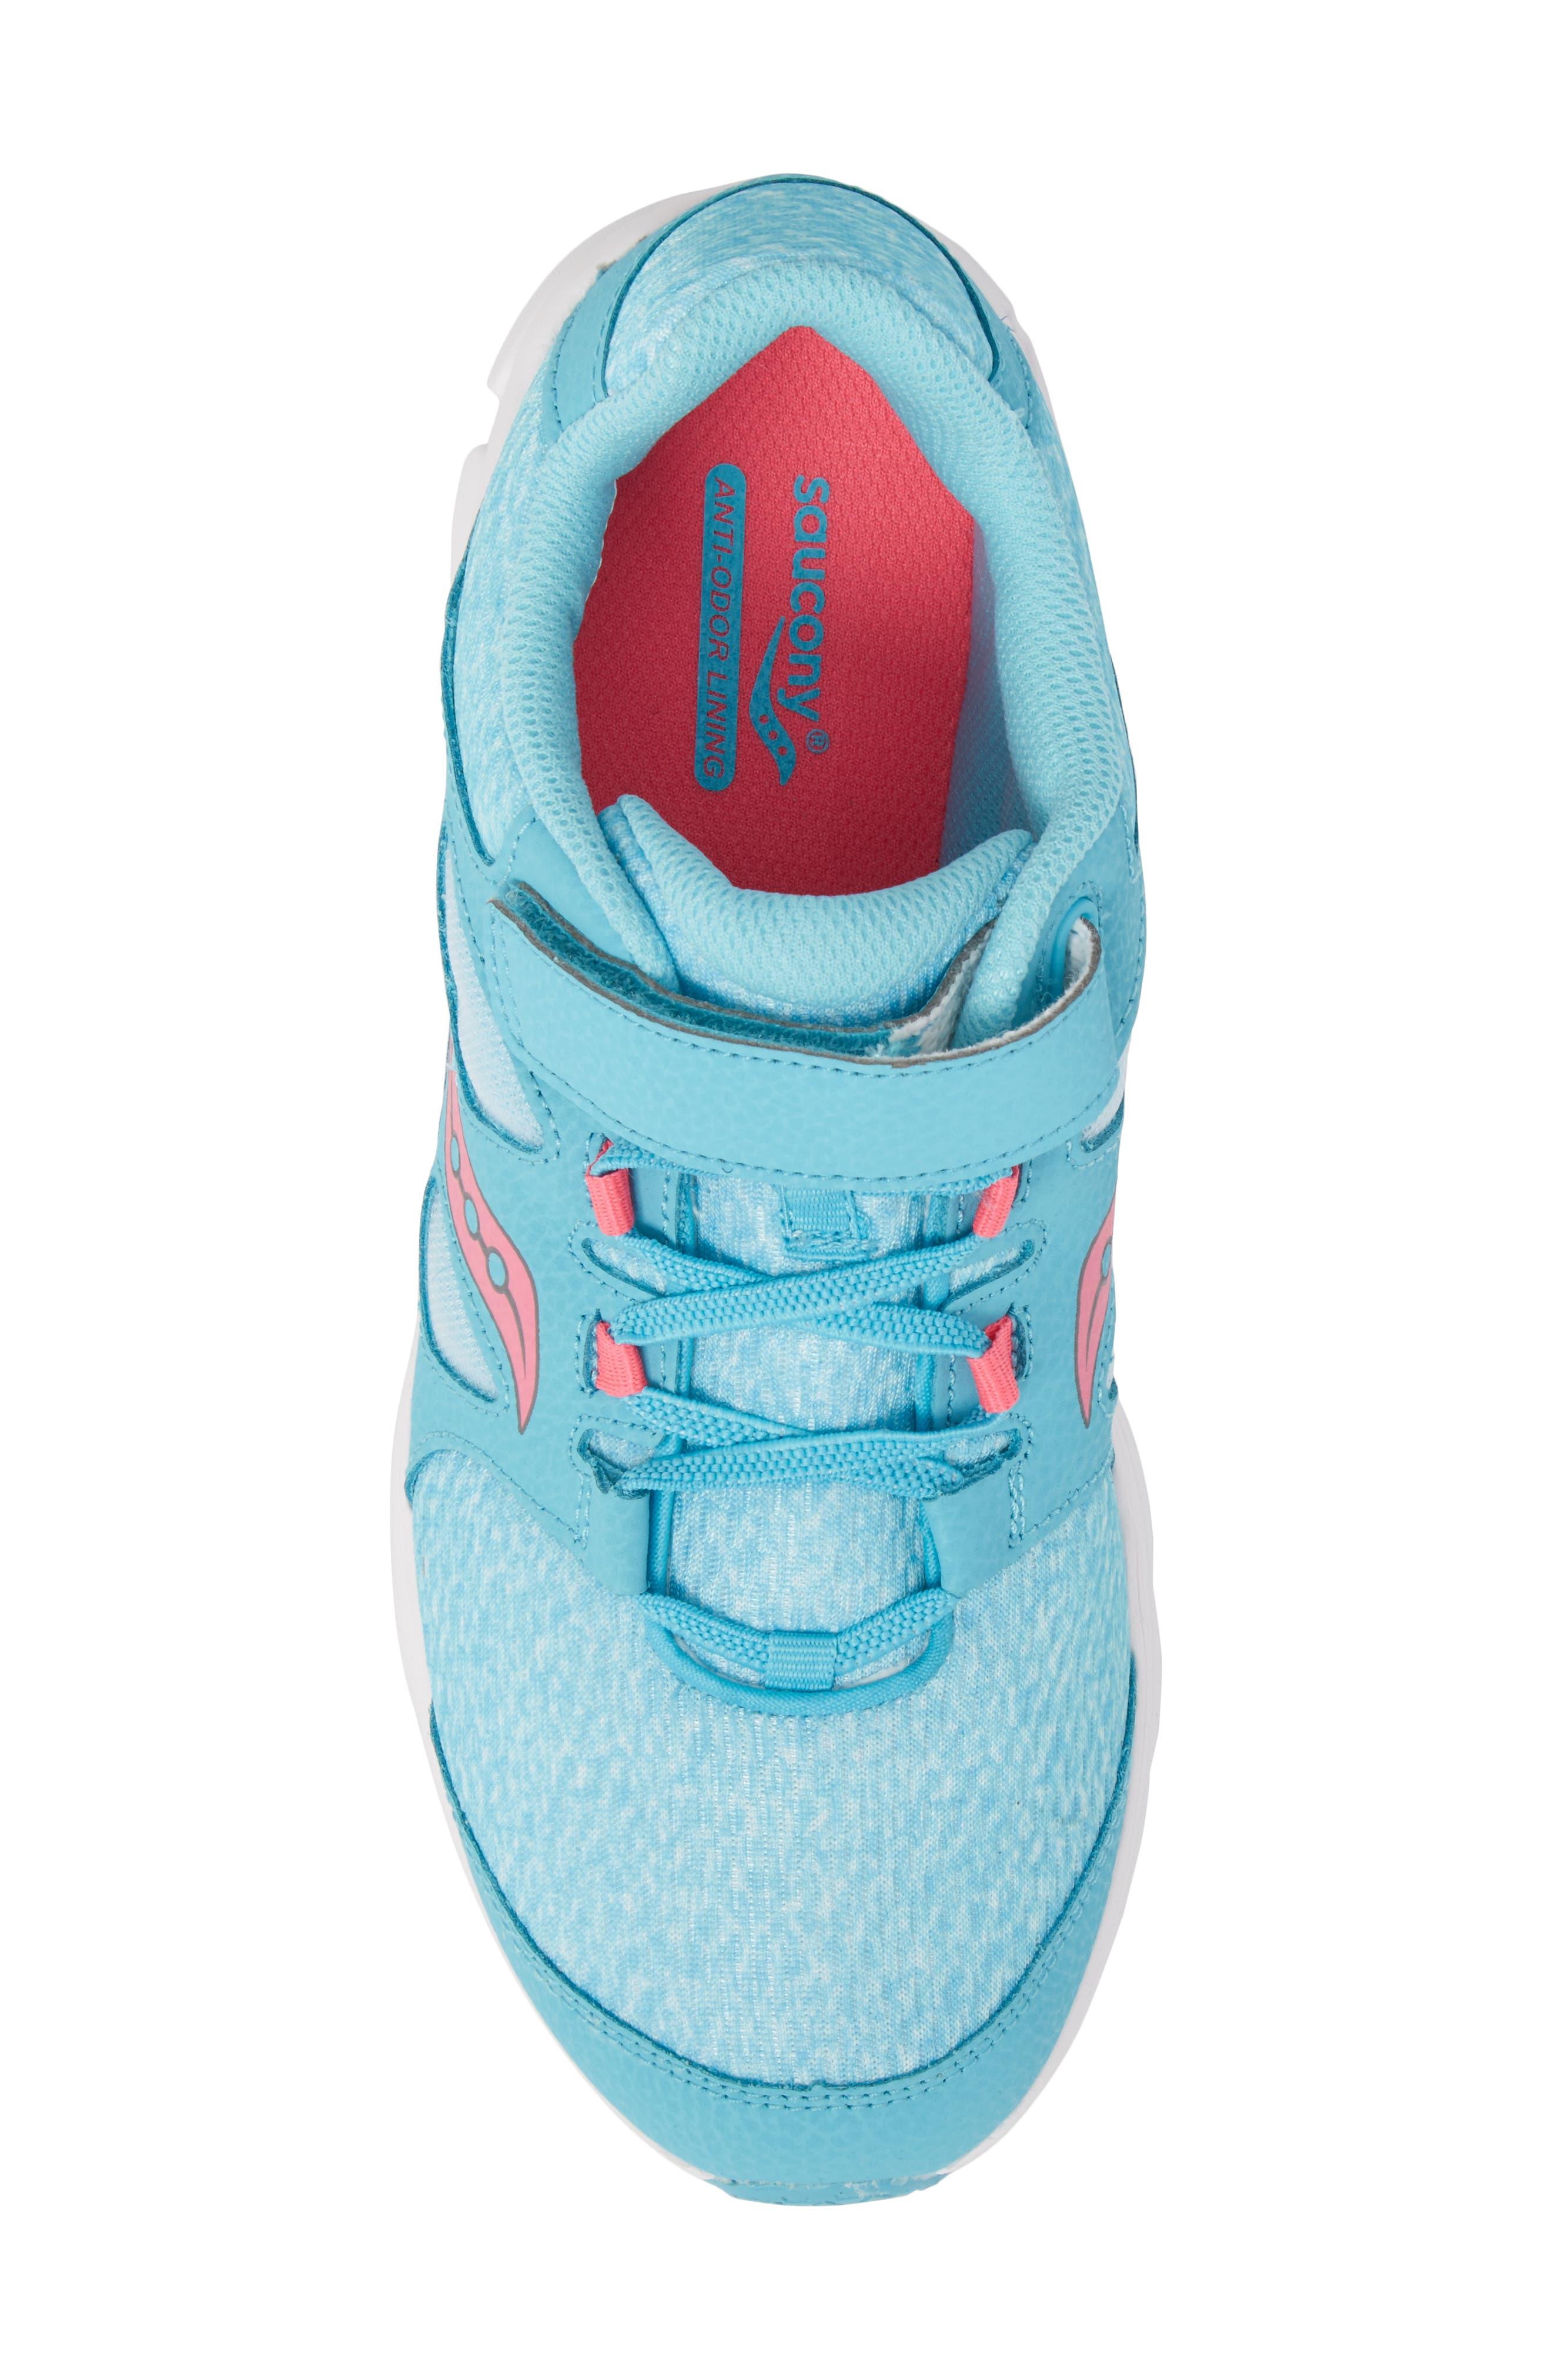 Kotaro 4 Sneaker,                             Alternate thumbnail 5, color,                             Turquoise/ Pink